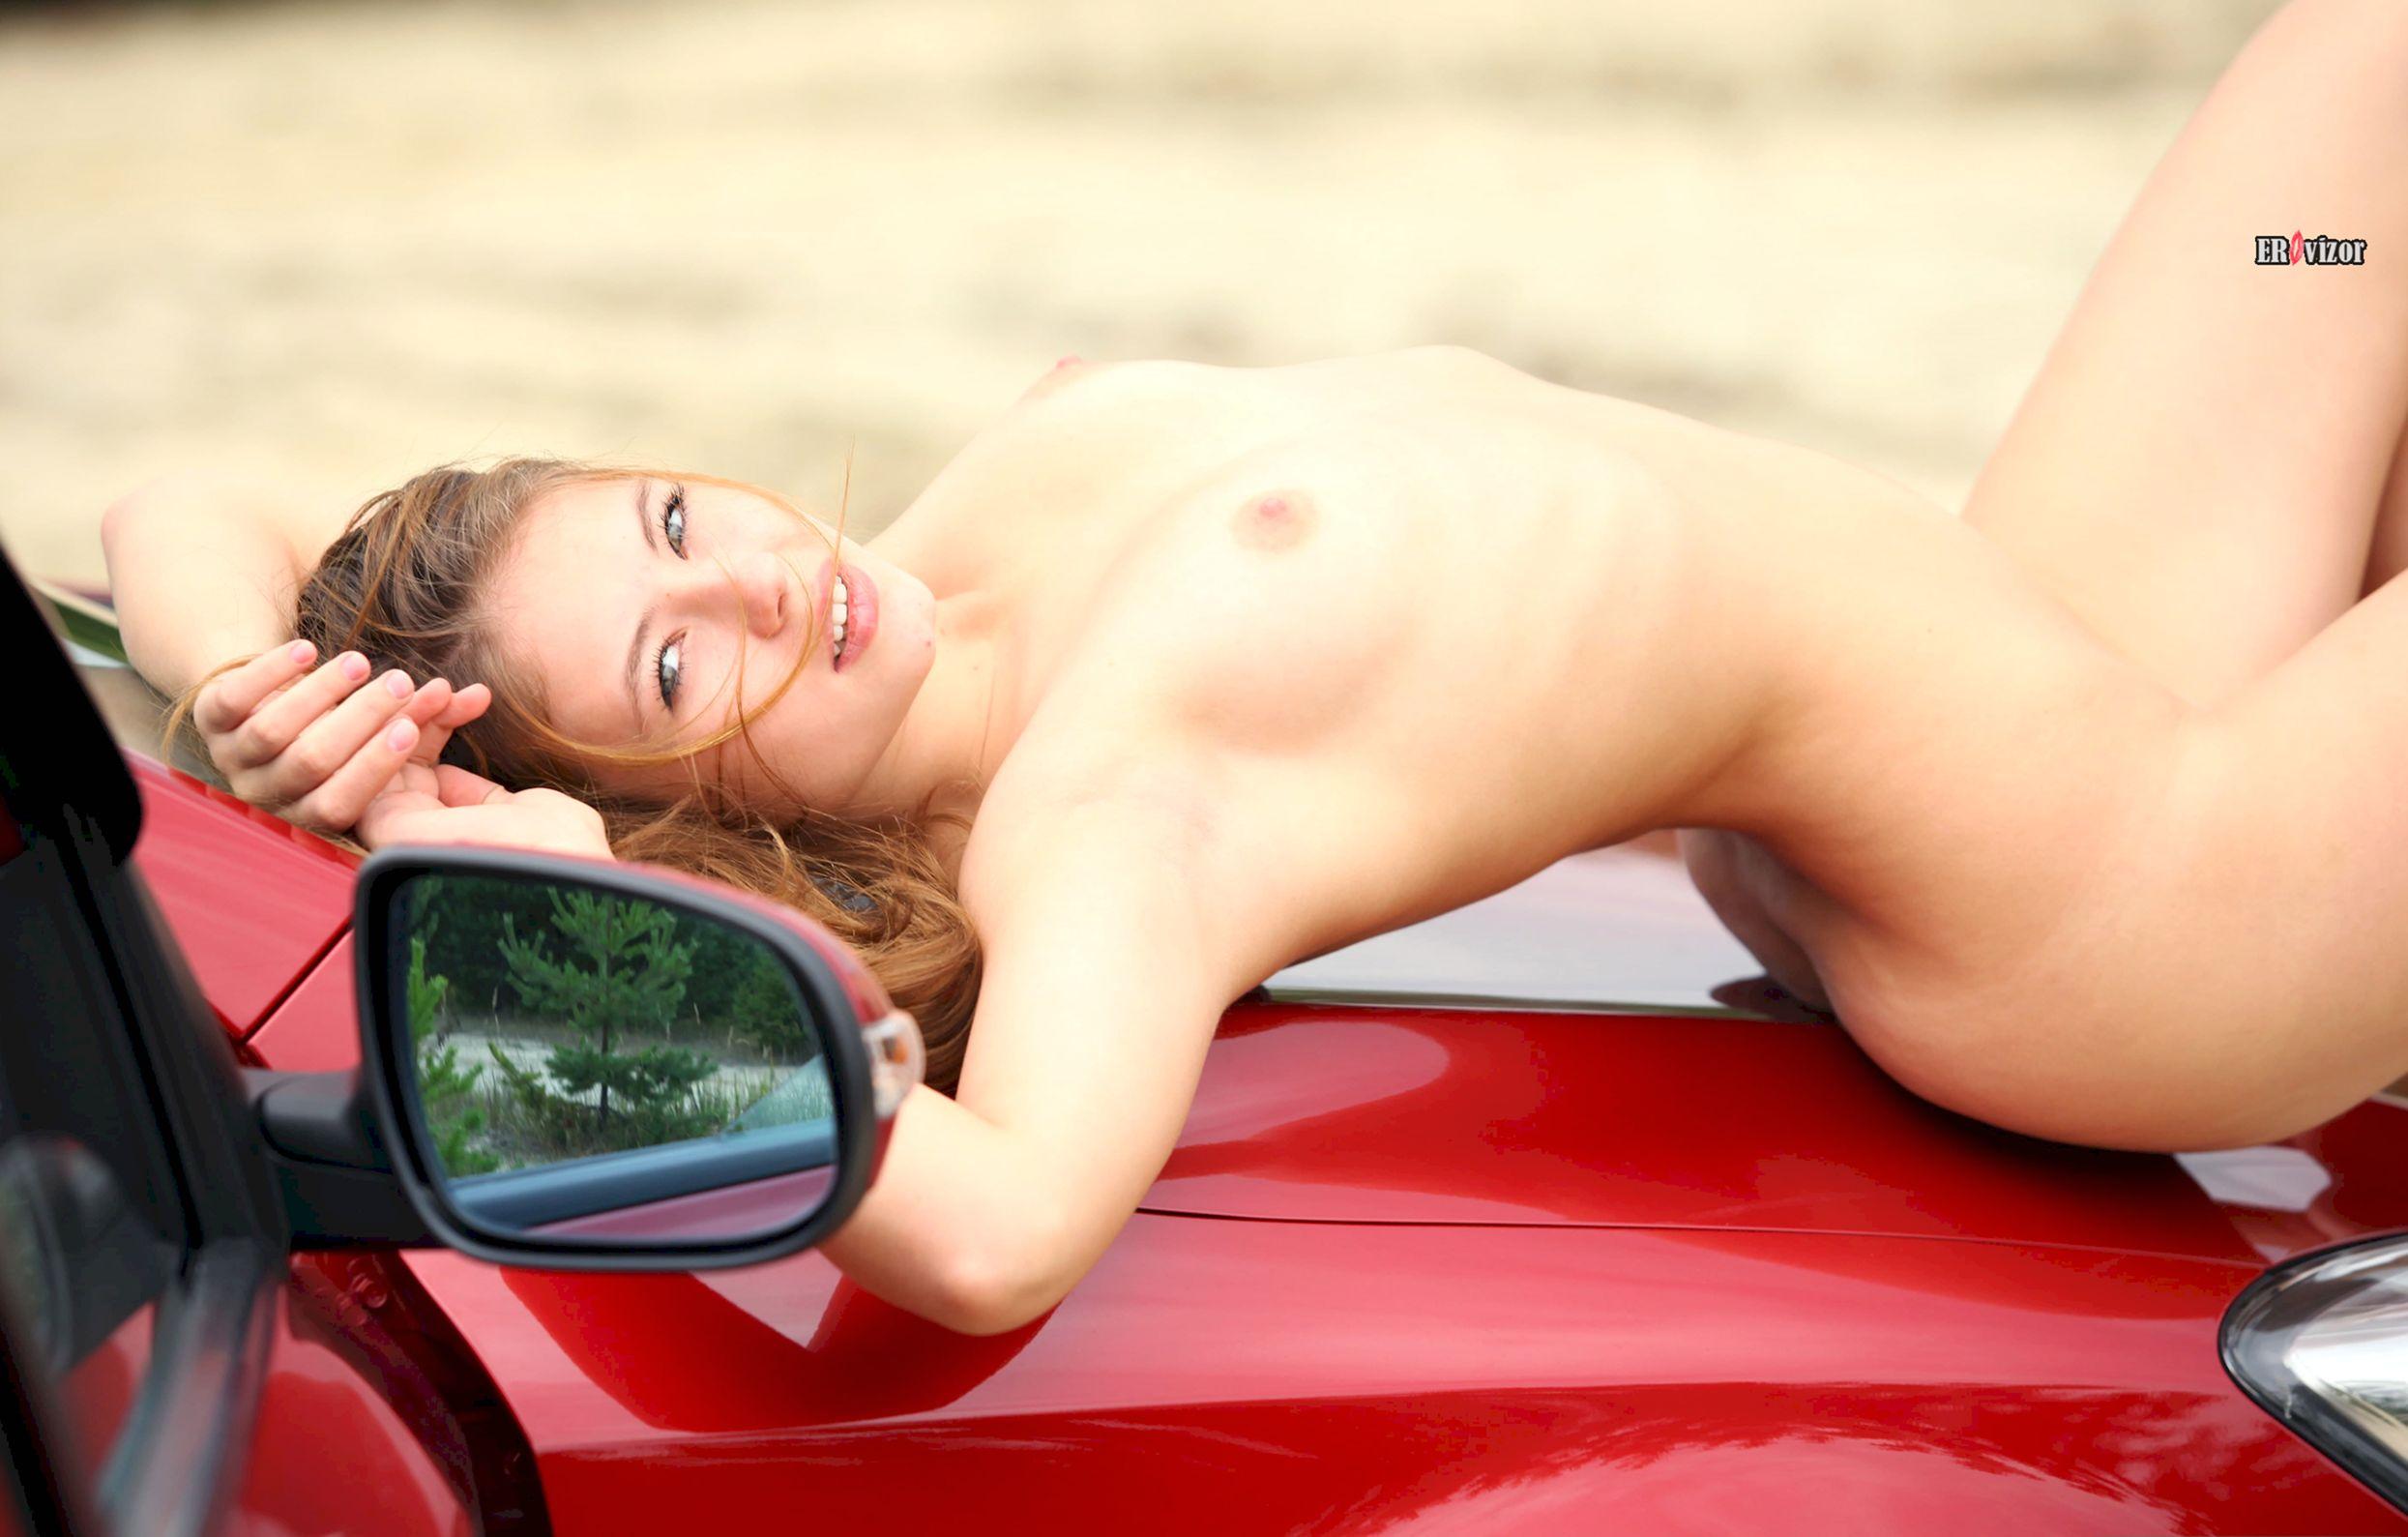 Viktoria-Aliko-with-Open-Pussy-in-Car-erovizor1 (11)